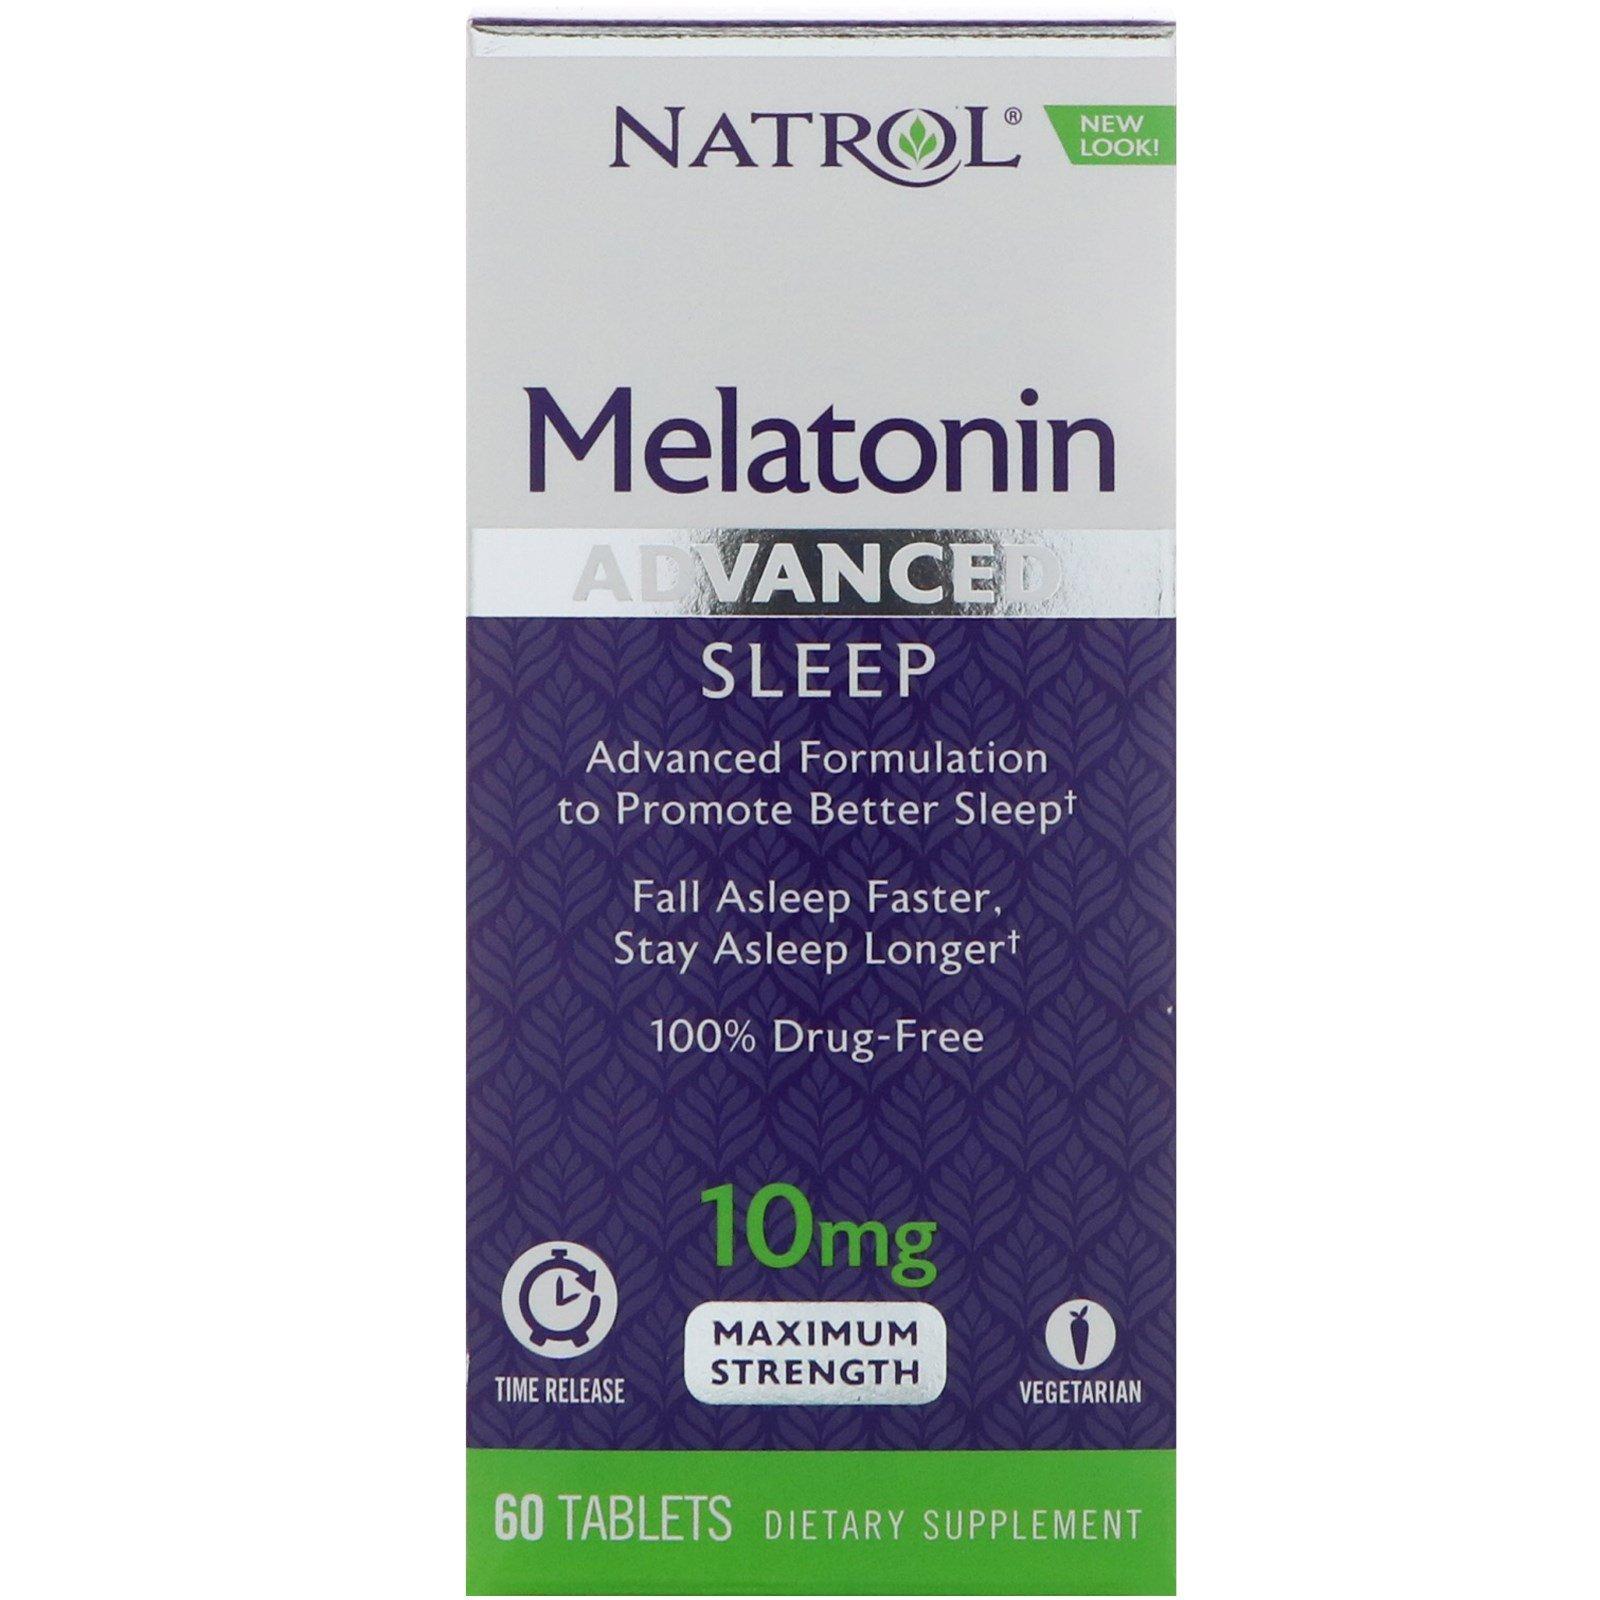 Comprar Melatonina no Brasil